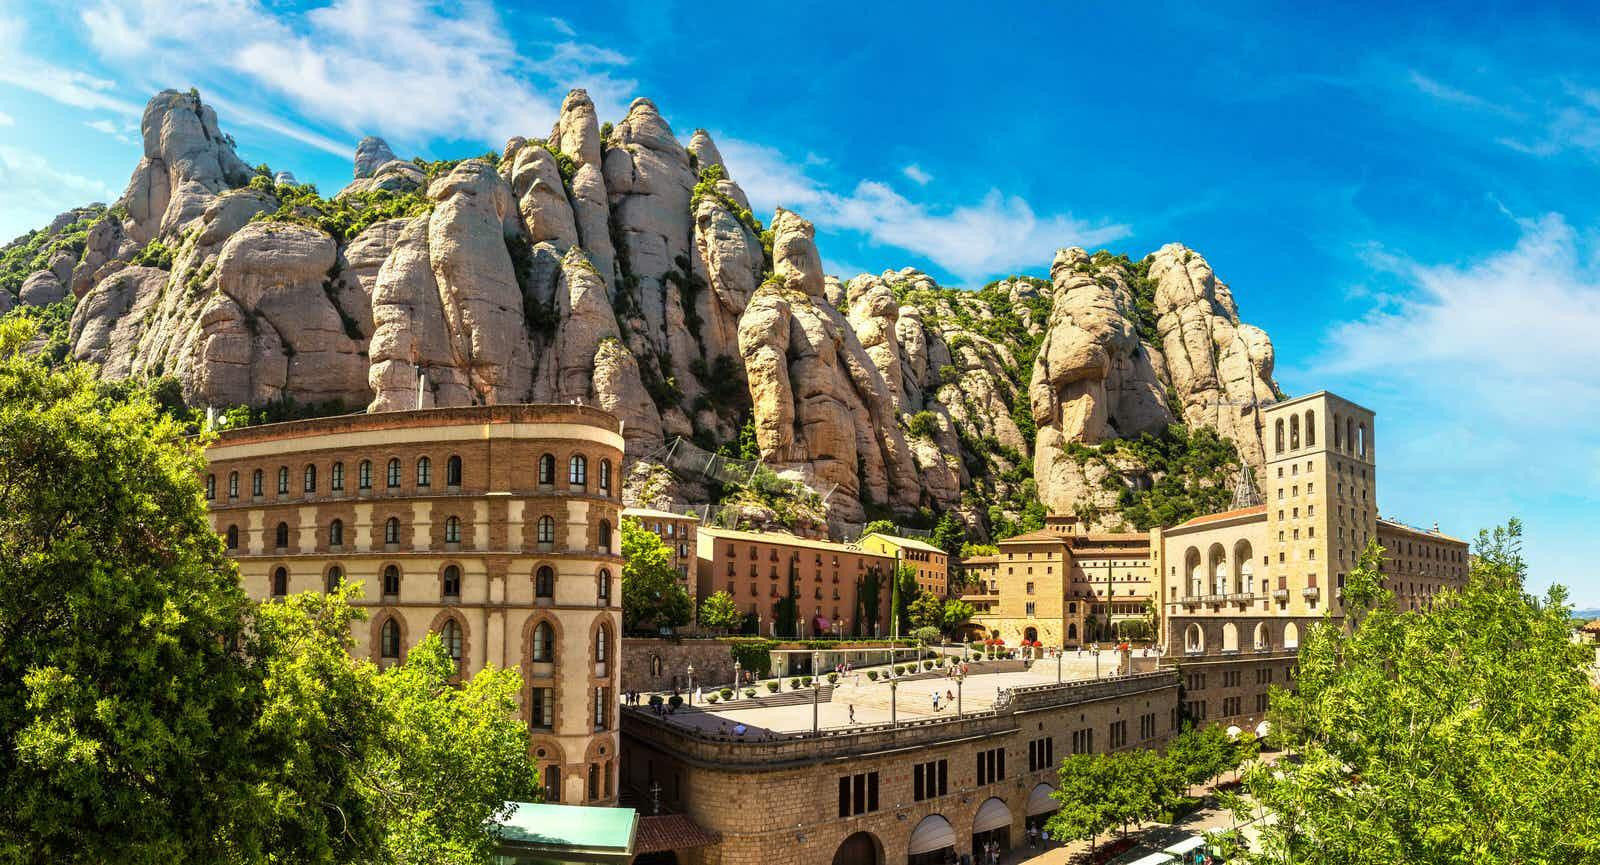 The Monestir de Montserrat, nestled among rock formations © S-F / Shutterstock